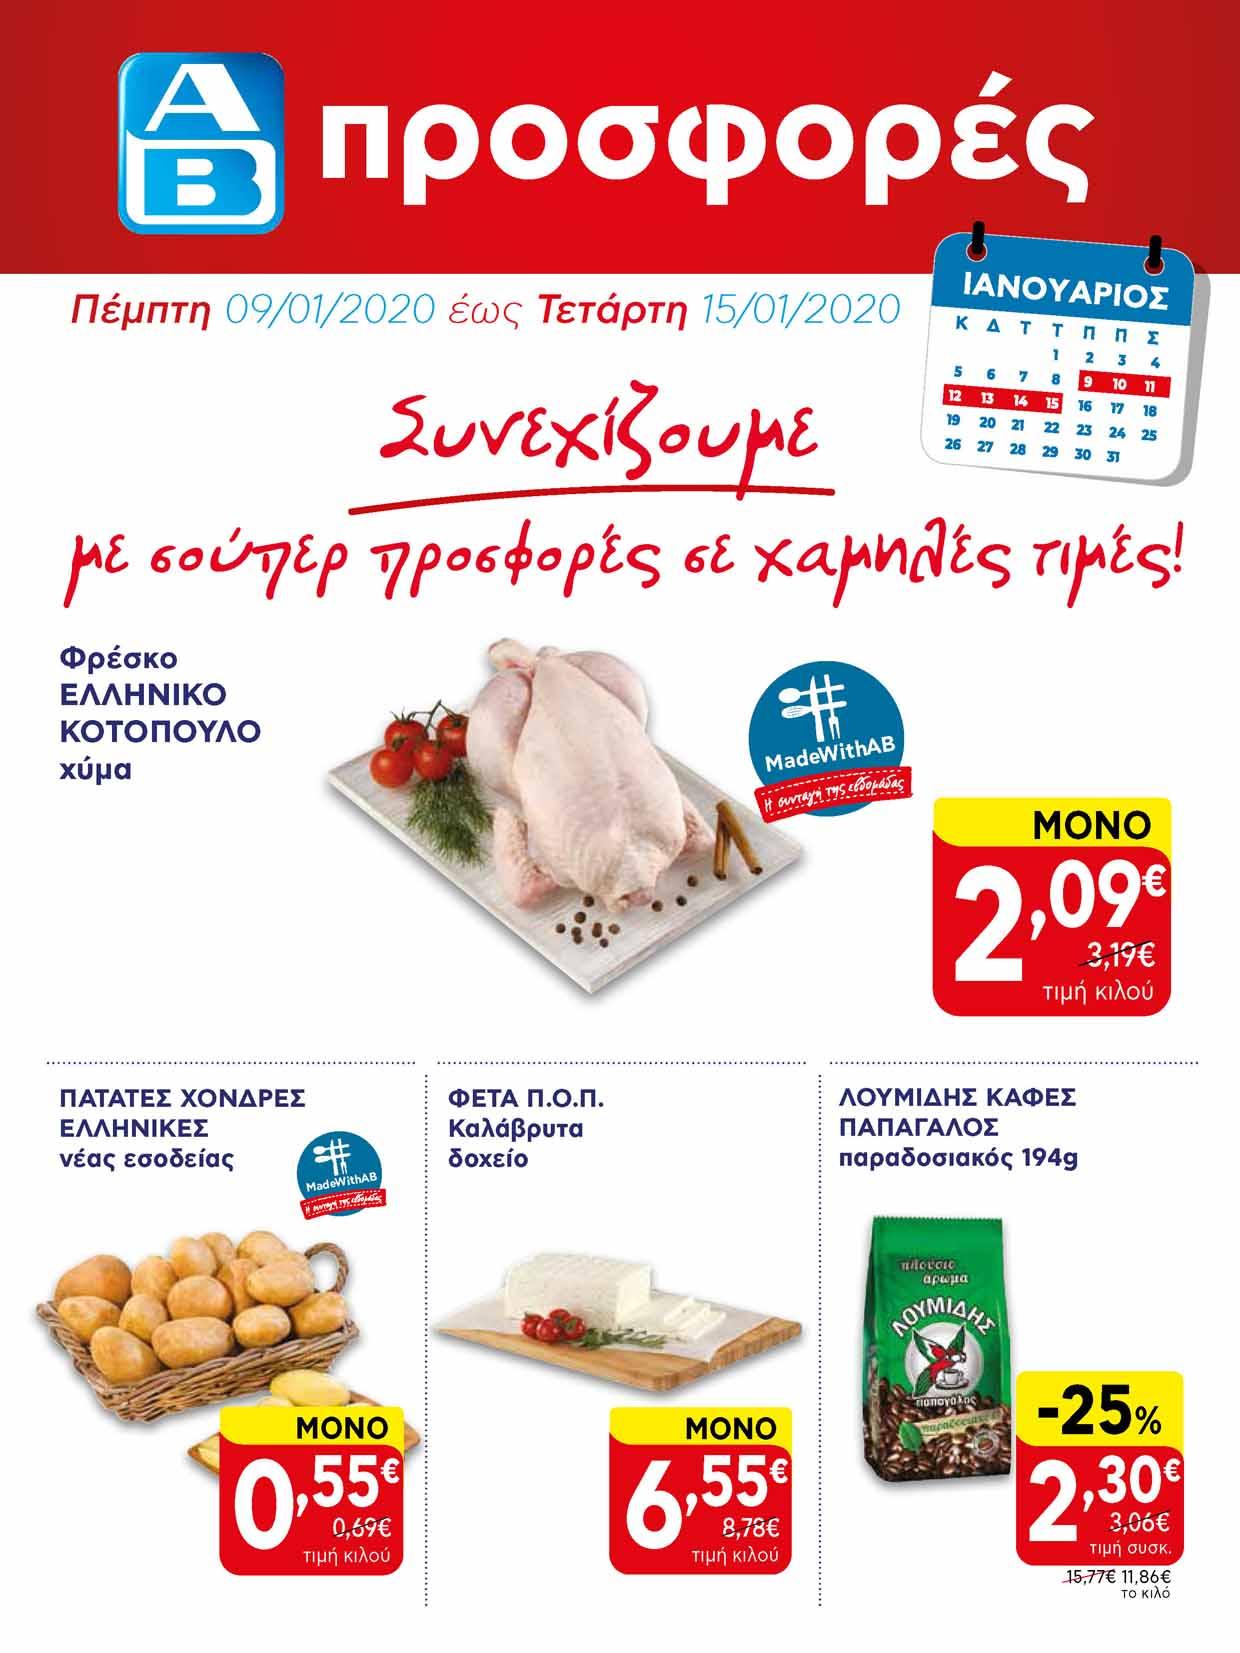 ab-basilopoulos-fylladio-ianouarios-2020-ab-prosfores-(1)